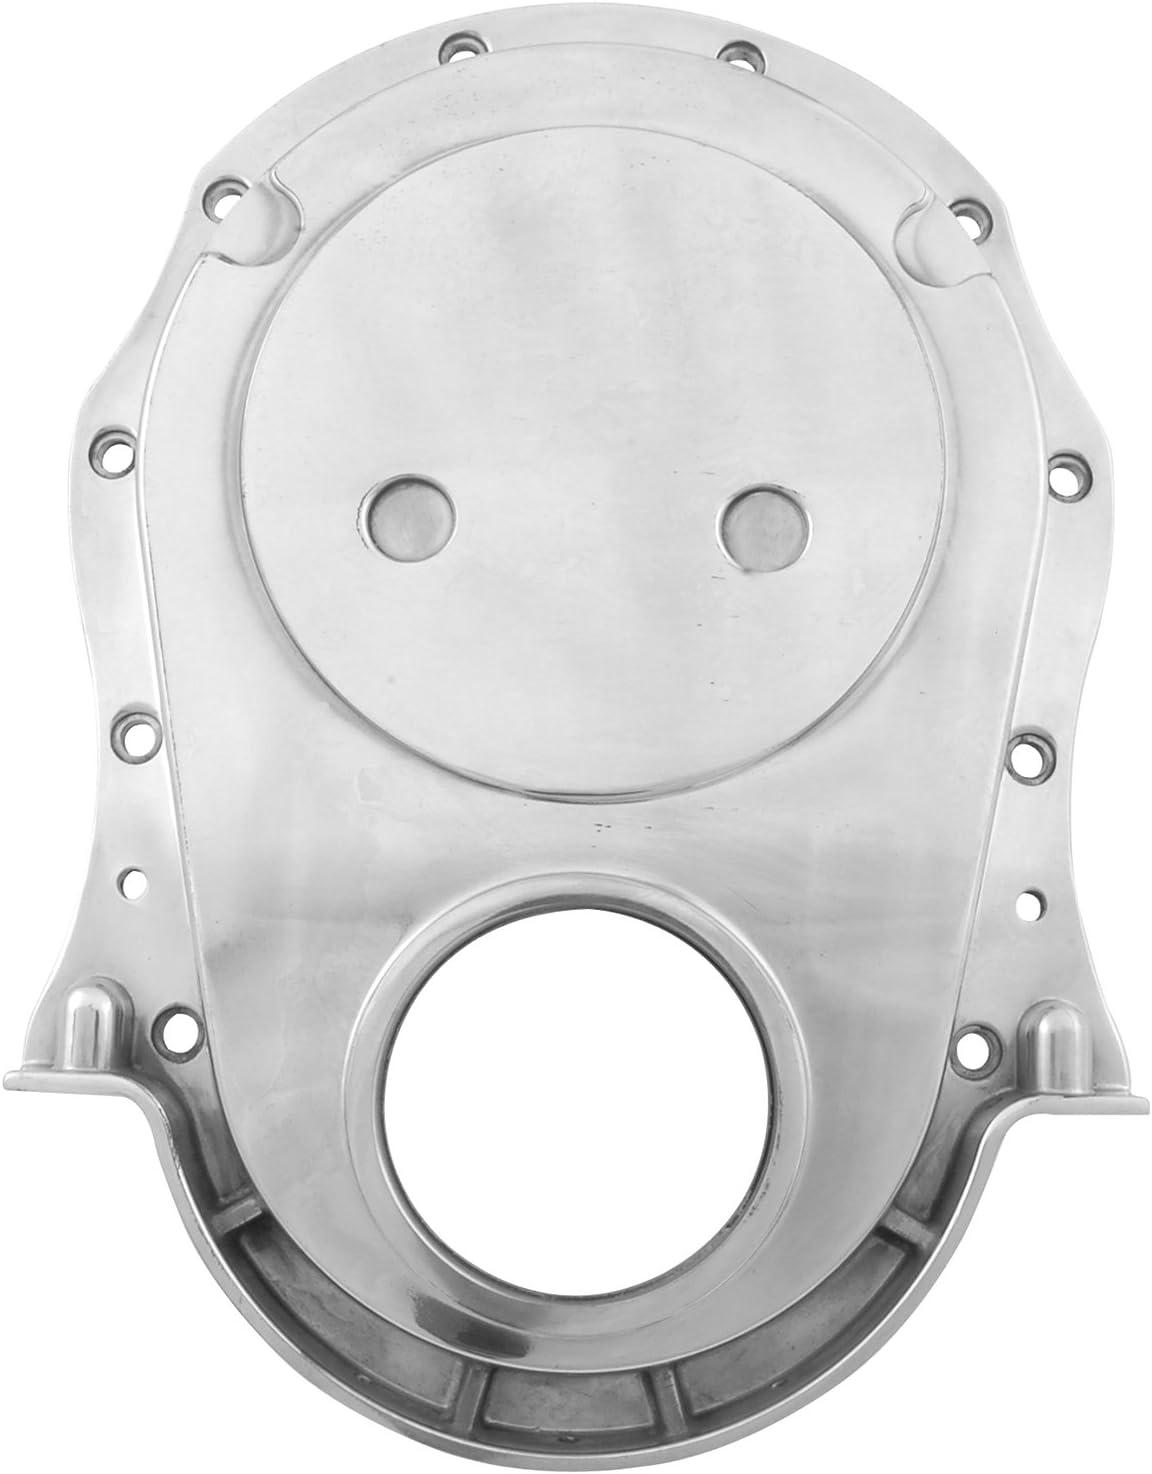 Max 61% OFF Allstar Performance ALL90009 Timing Washington Mall Cover Aluminum